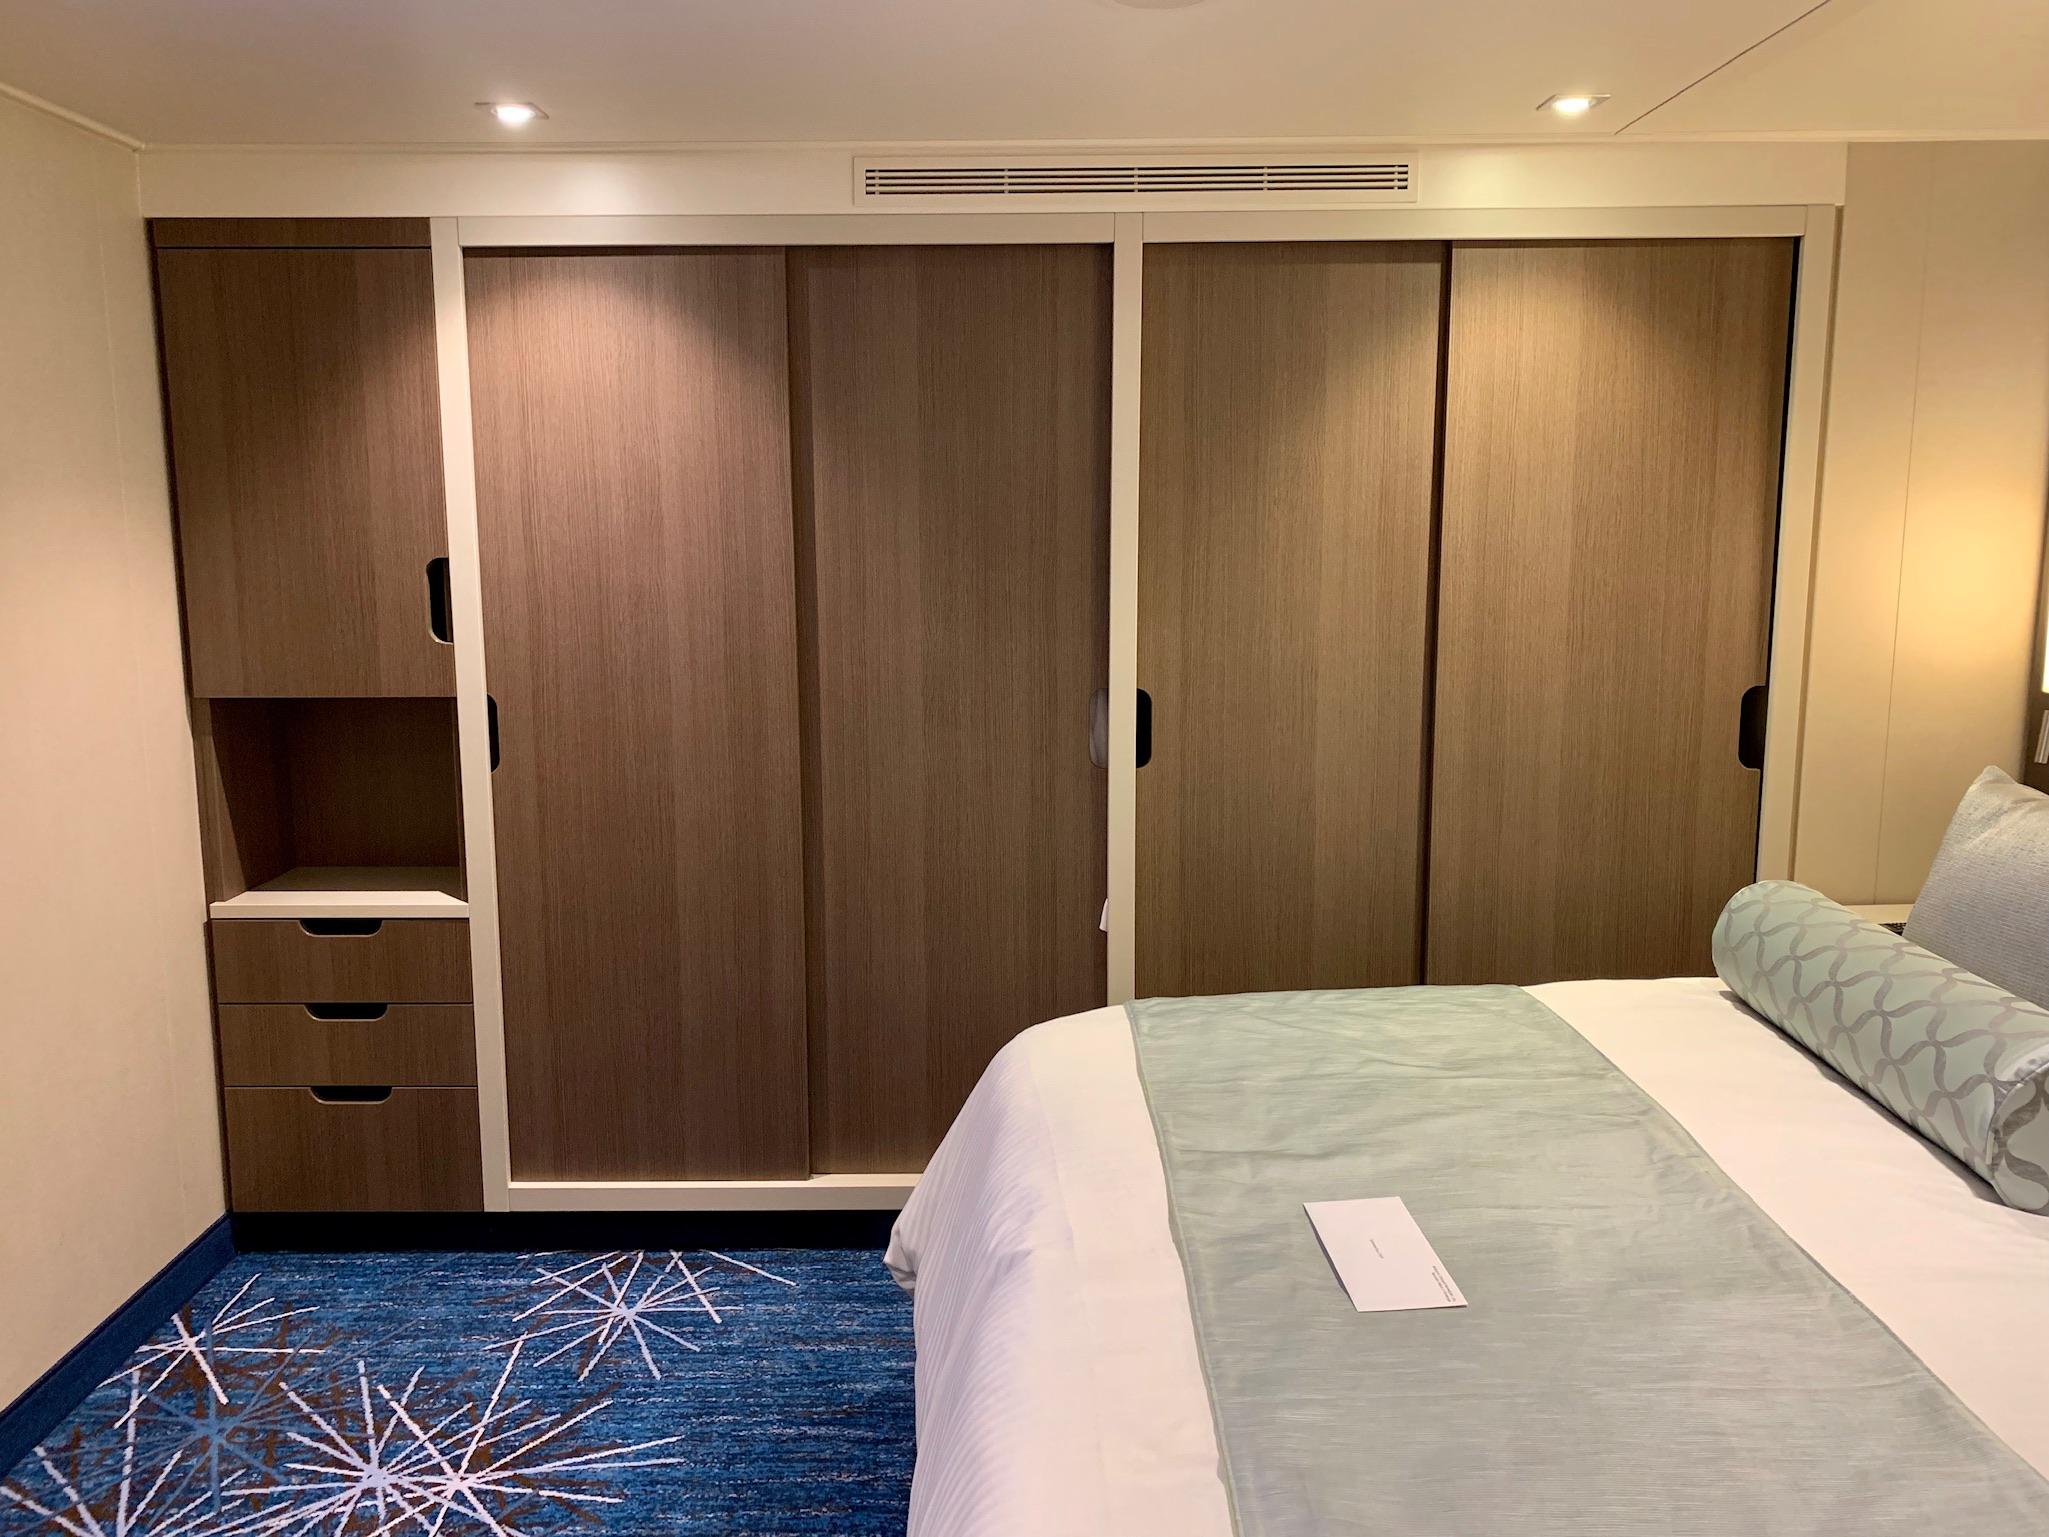 NCL Joy Room Concierge Family Inside Master Bedroom Storage.jpg